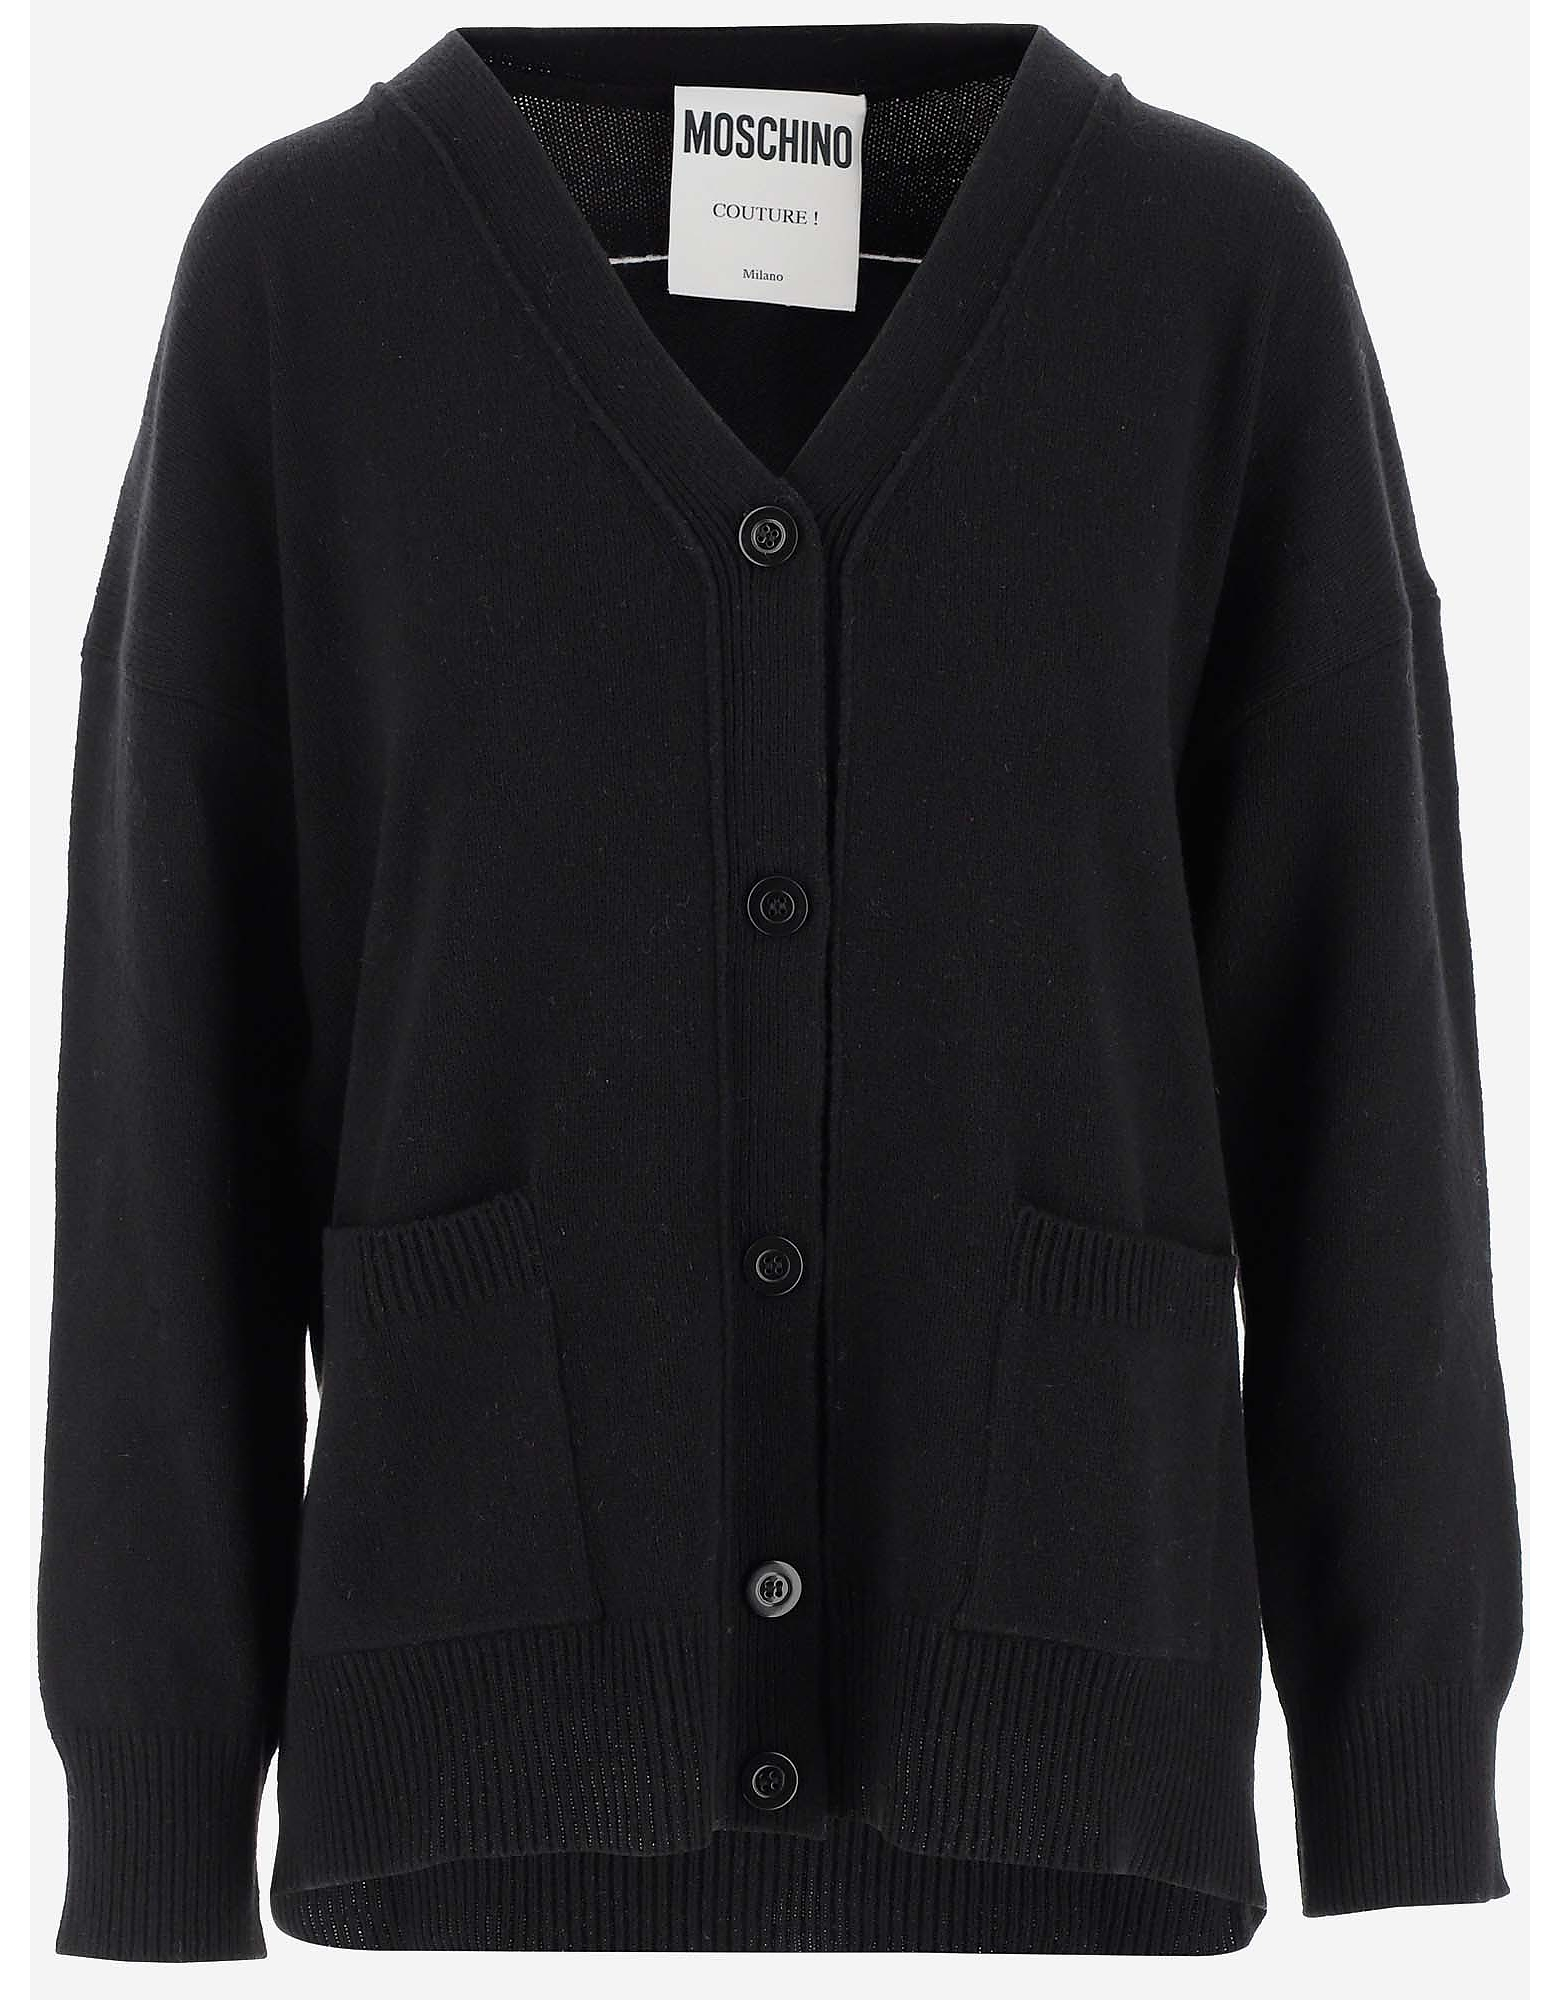 Moschino Designer Knitwear, Black Cashmere Women's Cardigan